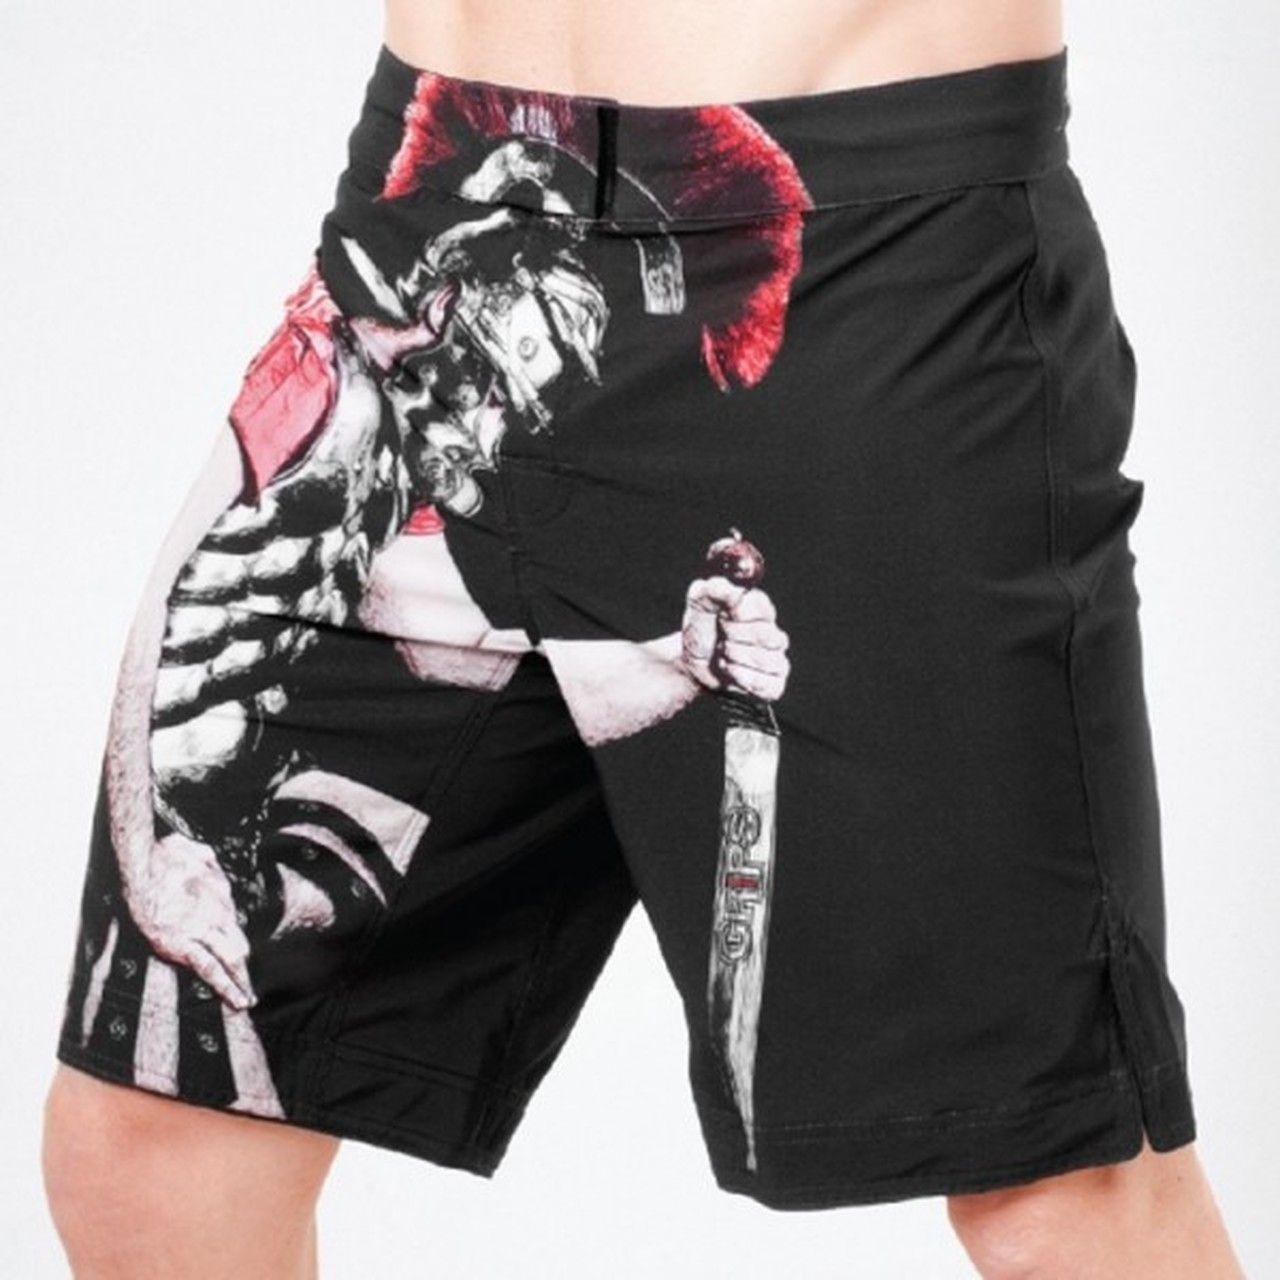 Grips Athletics Legionario Fight Shorts Black Fight Shorts Shorts Mma Shorts